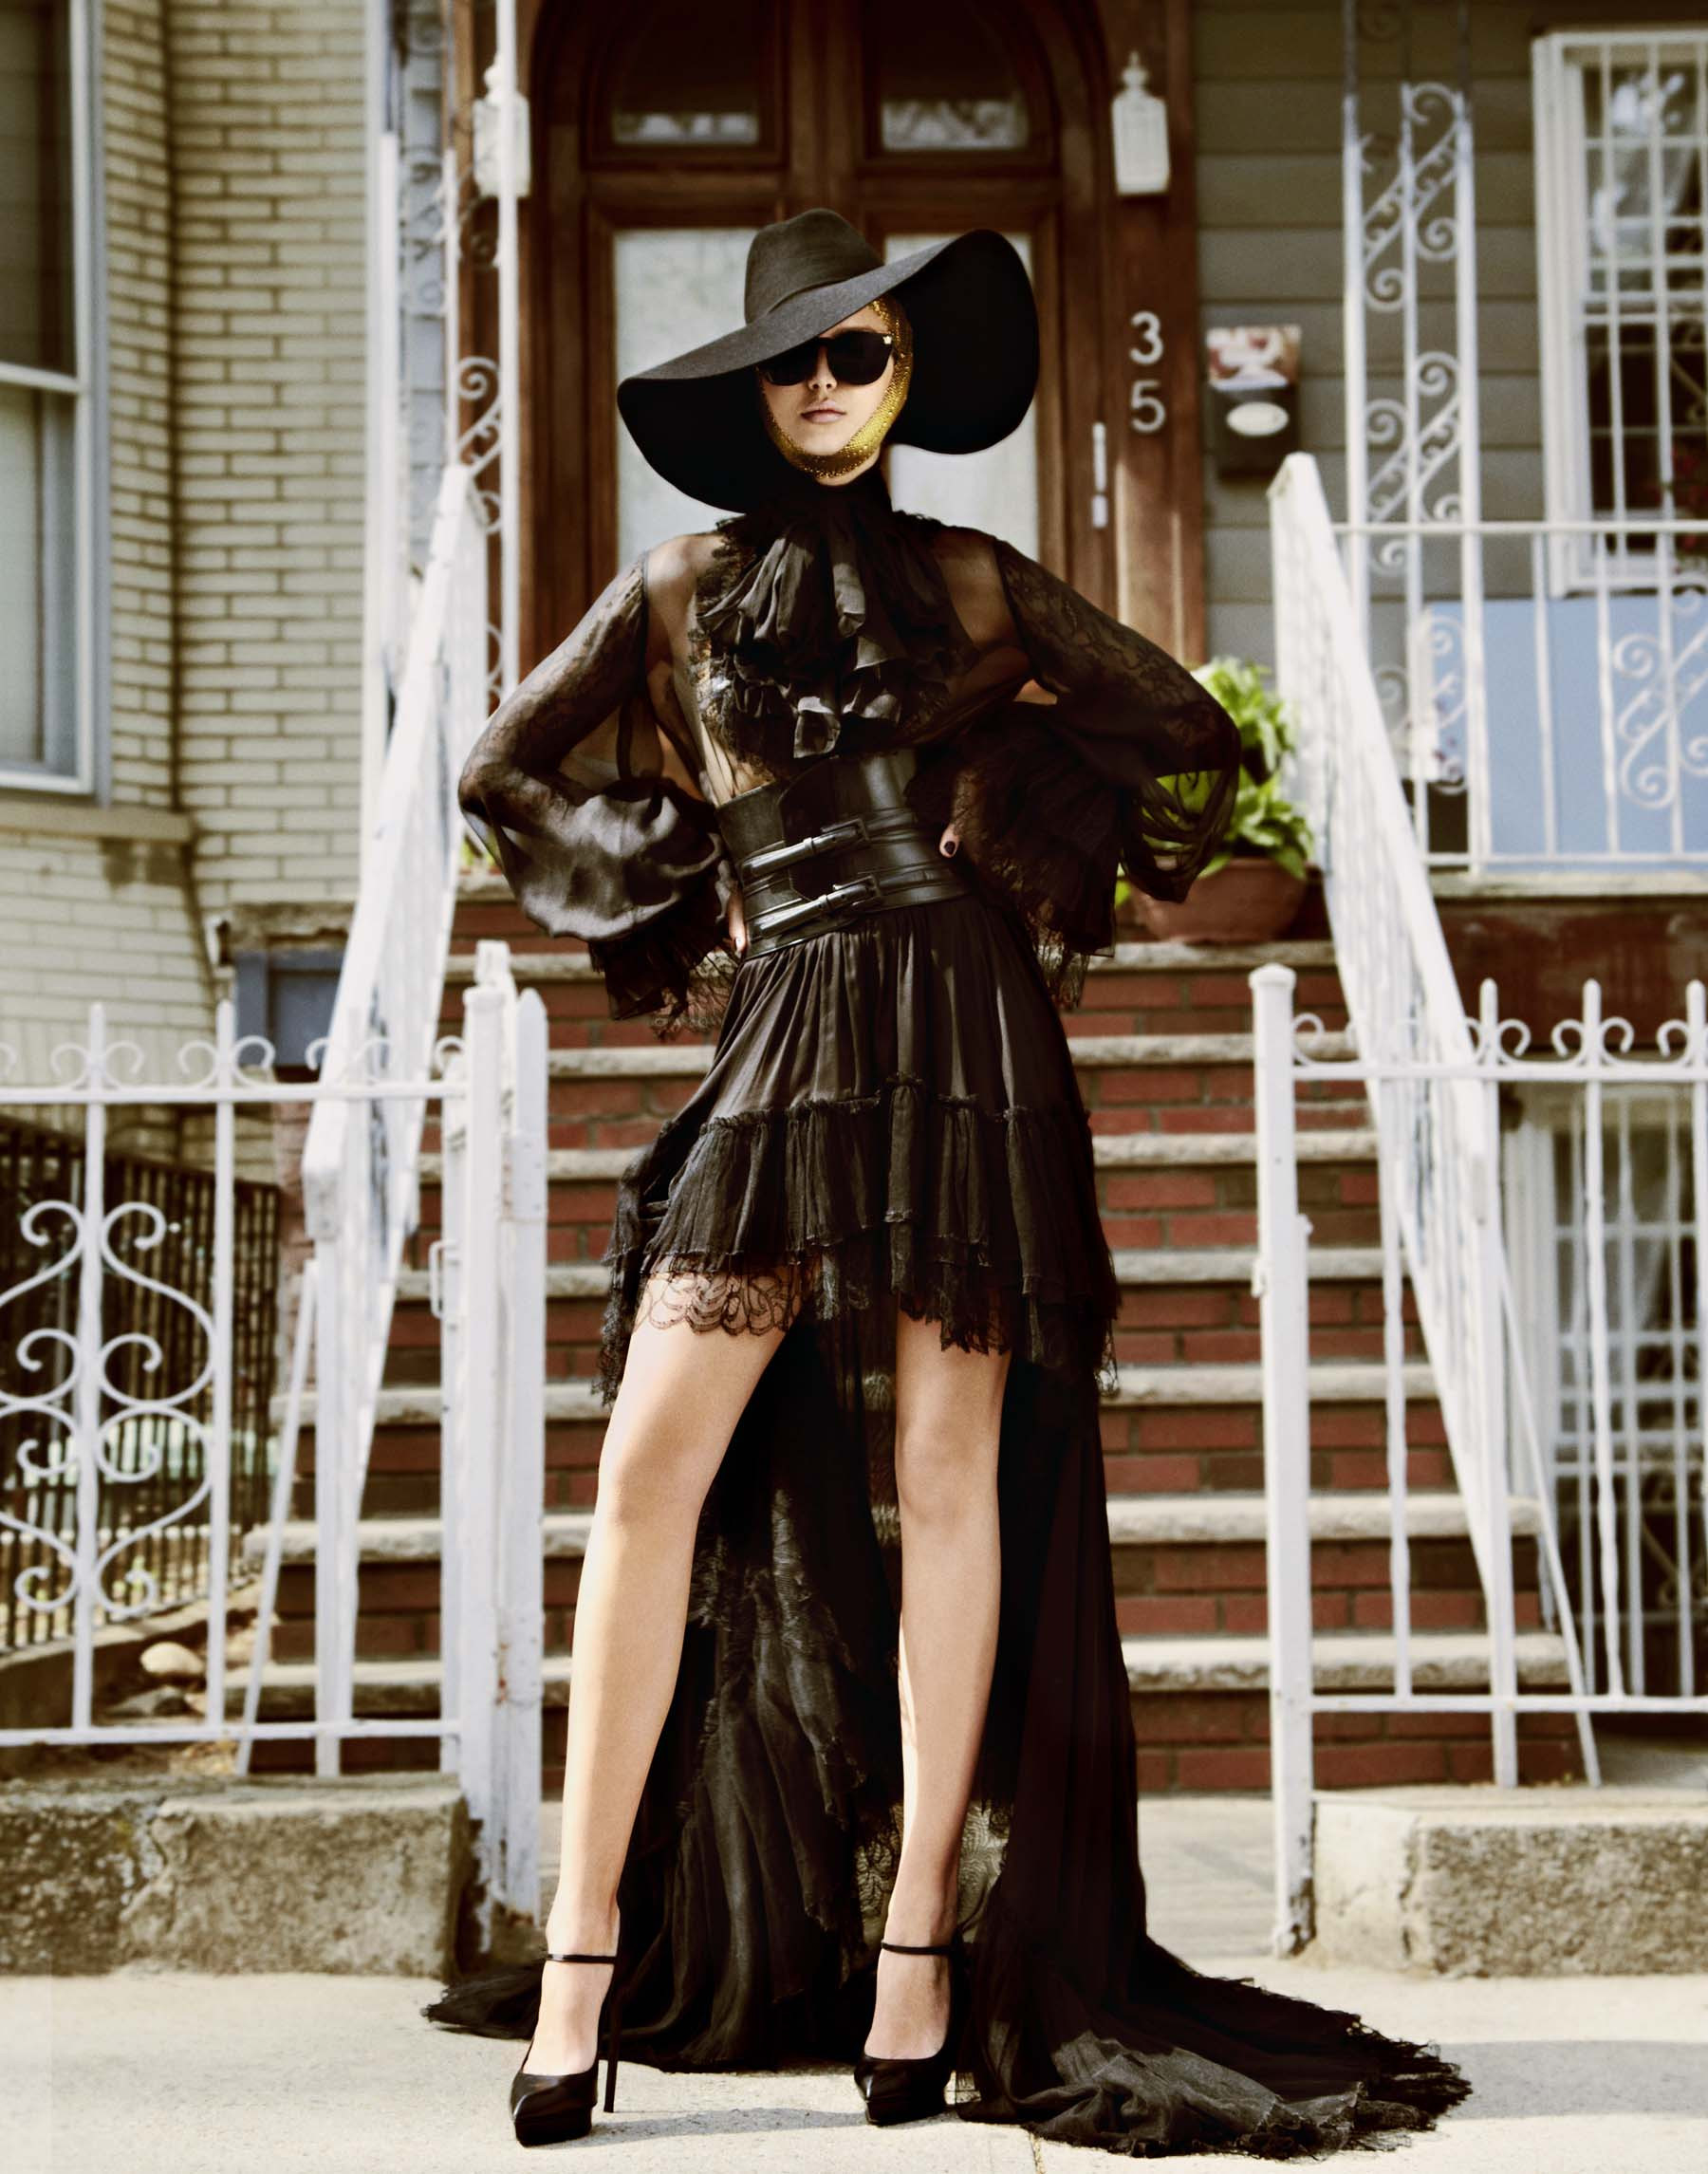 Saint Laurent / Josephine Skriver / V Magazine